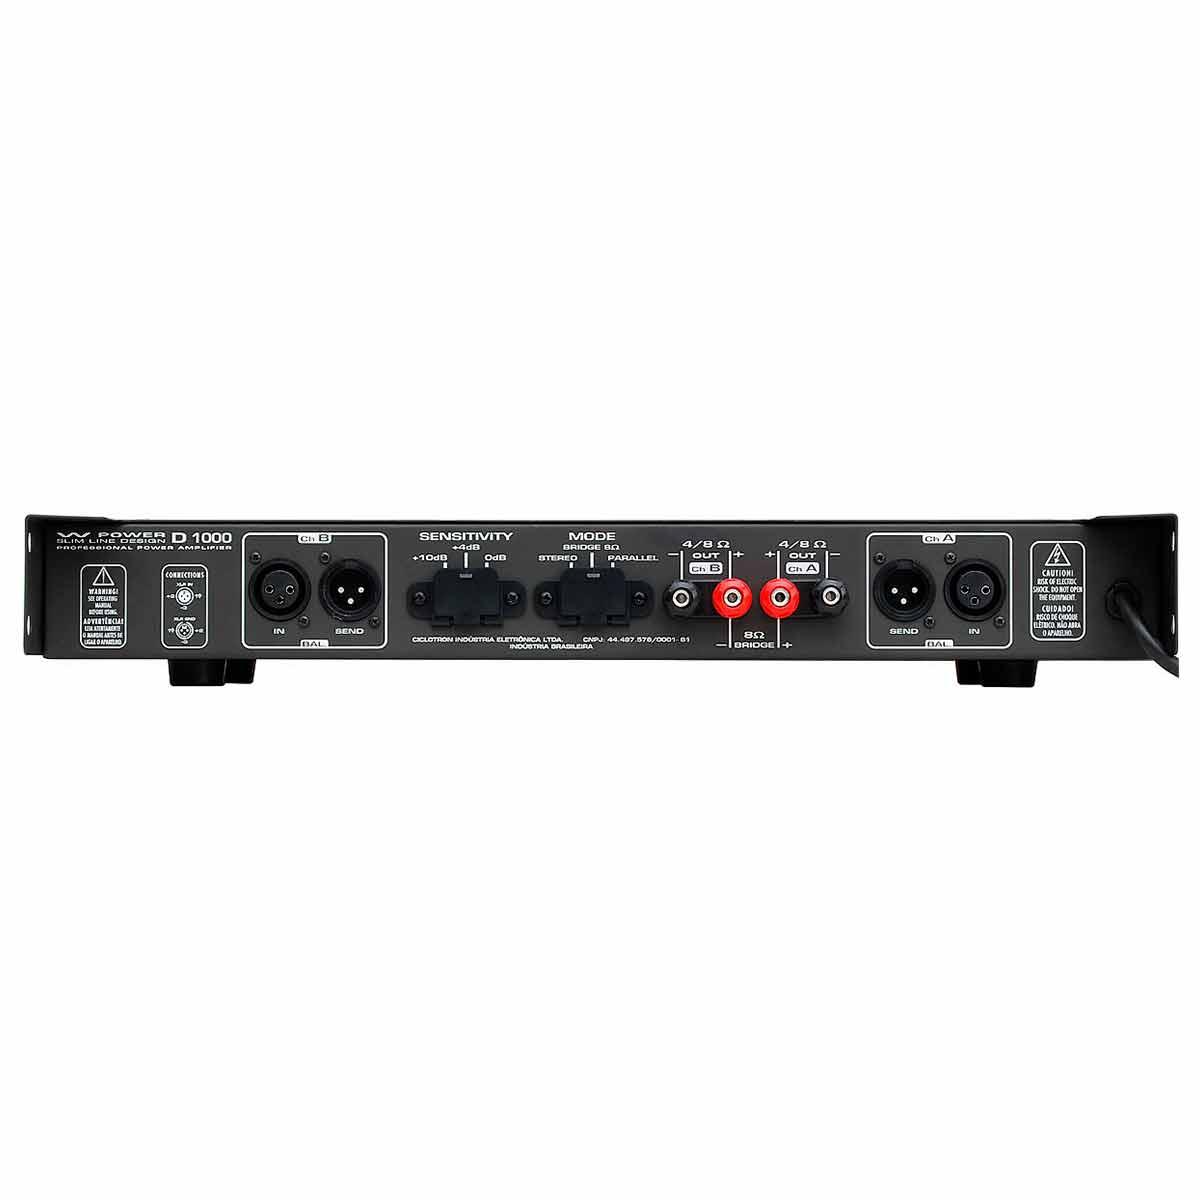 D1000 - Amplificador Estéreo 2 Canais 250W W Power D 1000 - Ciclotron